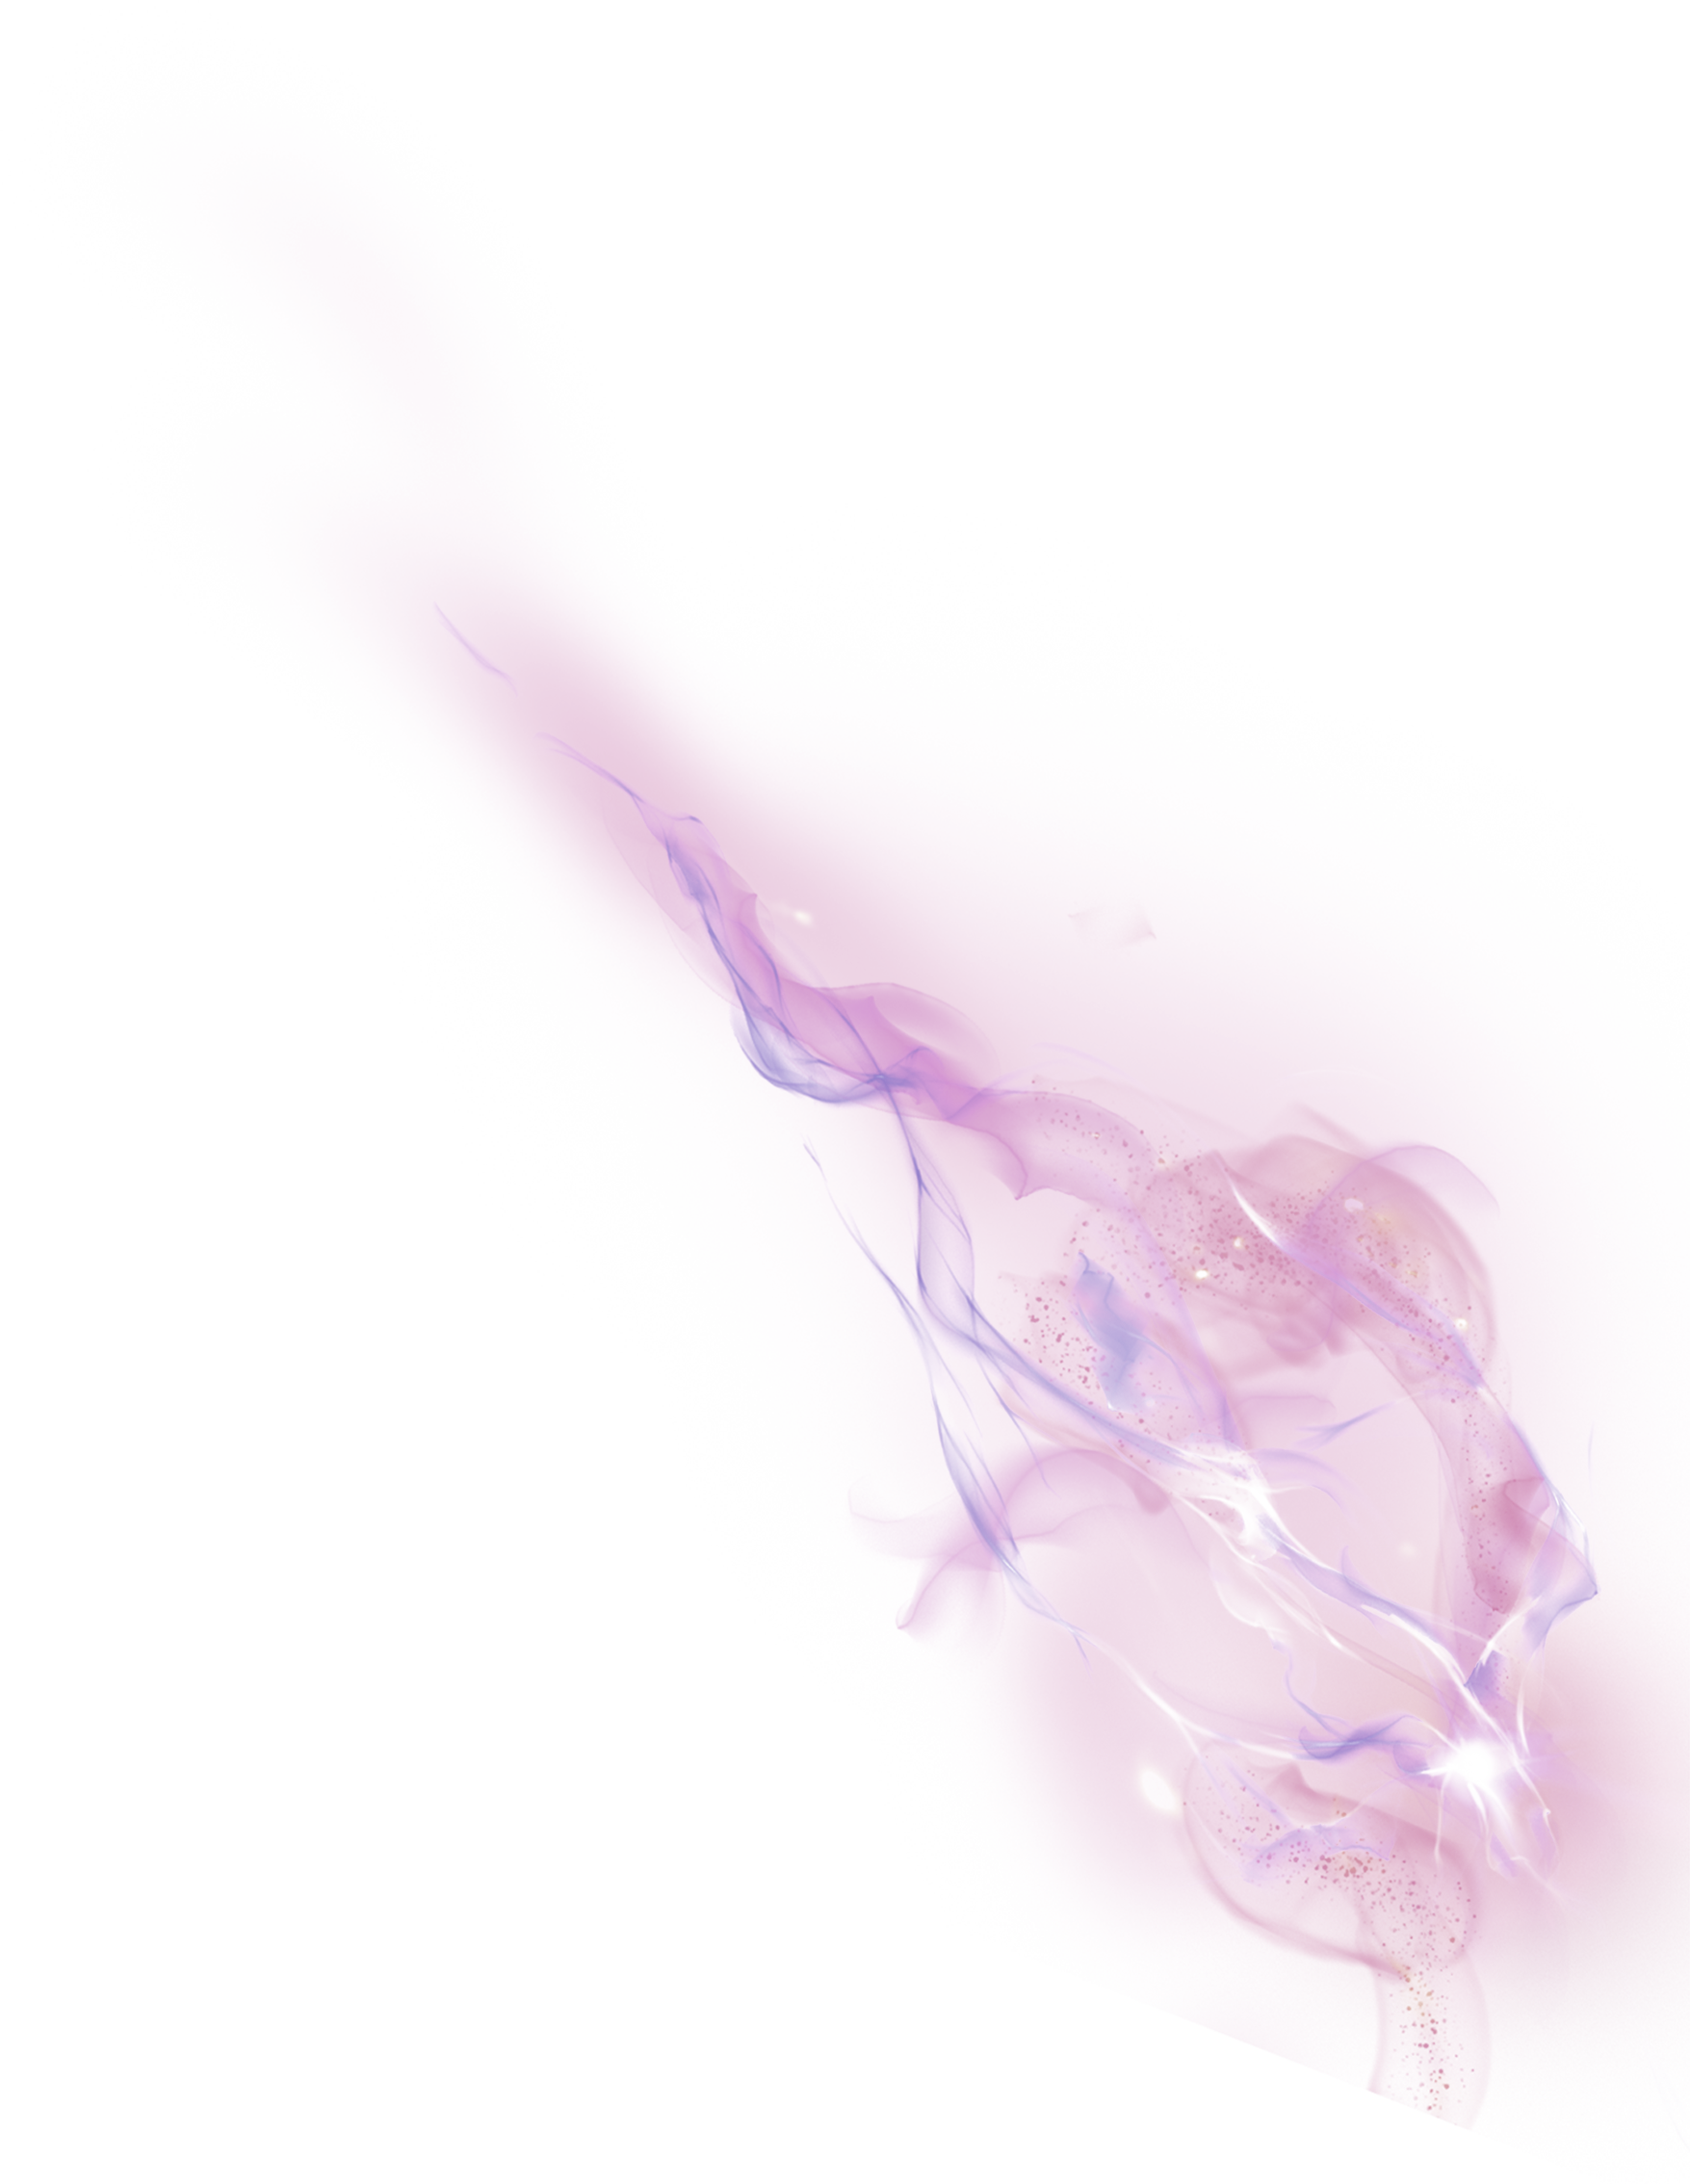 Pink Smoke Flame Effect 1755 2268 Pink Smoke Abstract Artwork Abstract